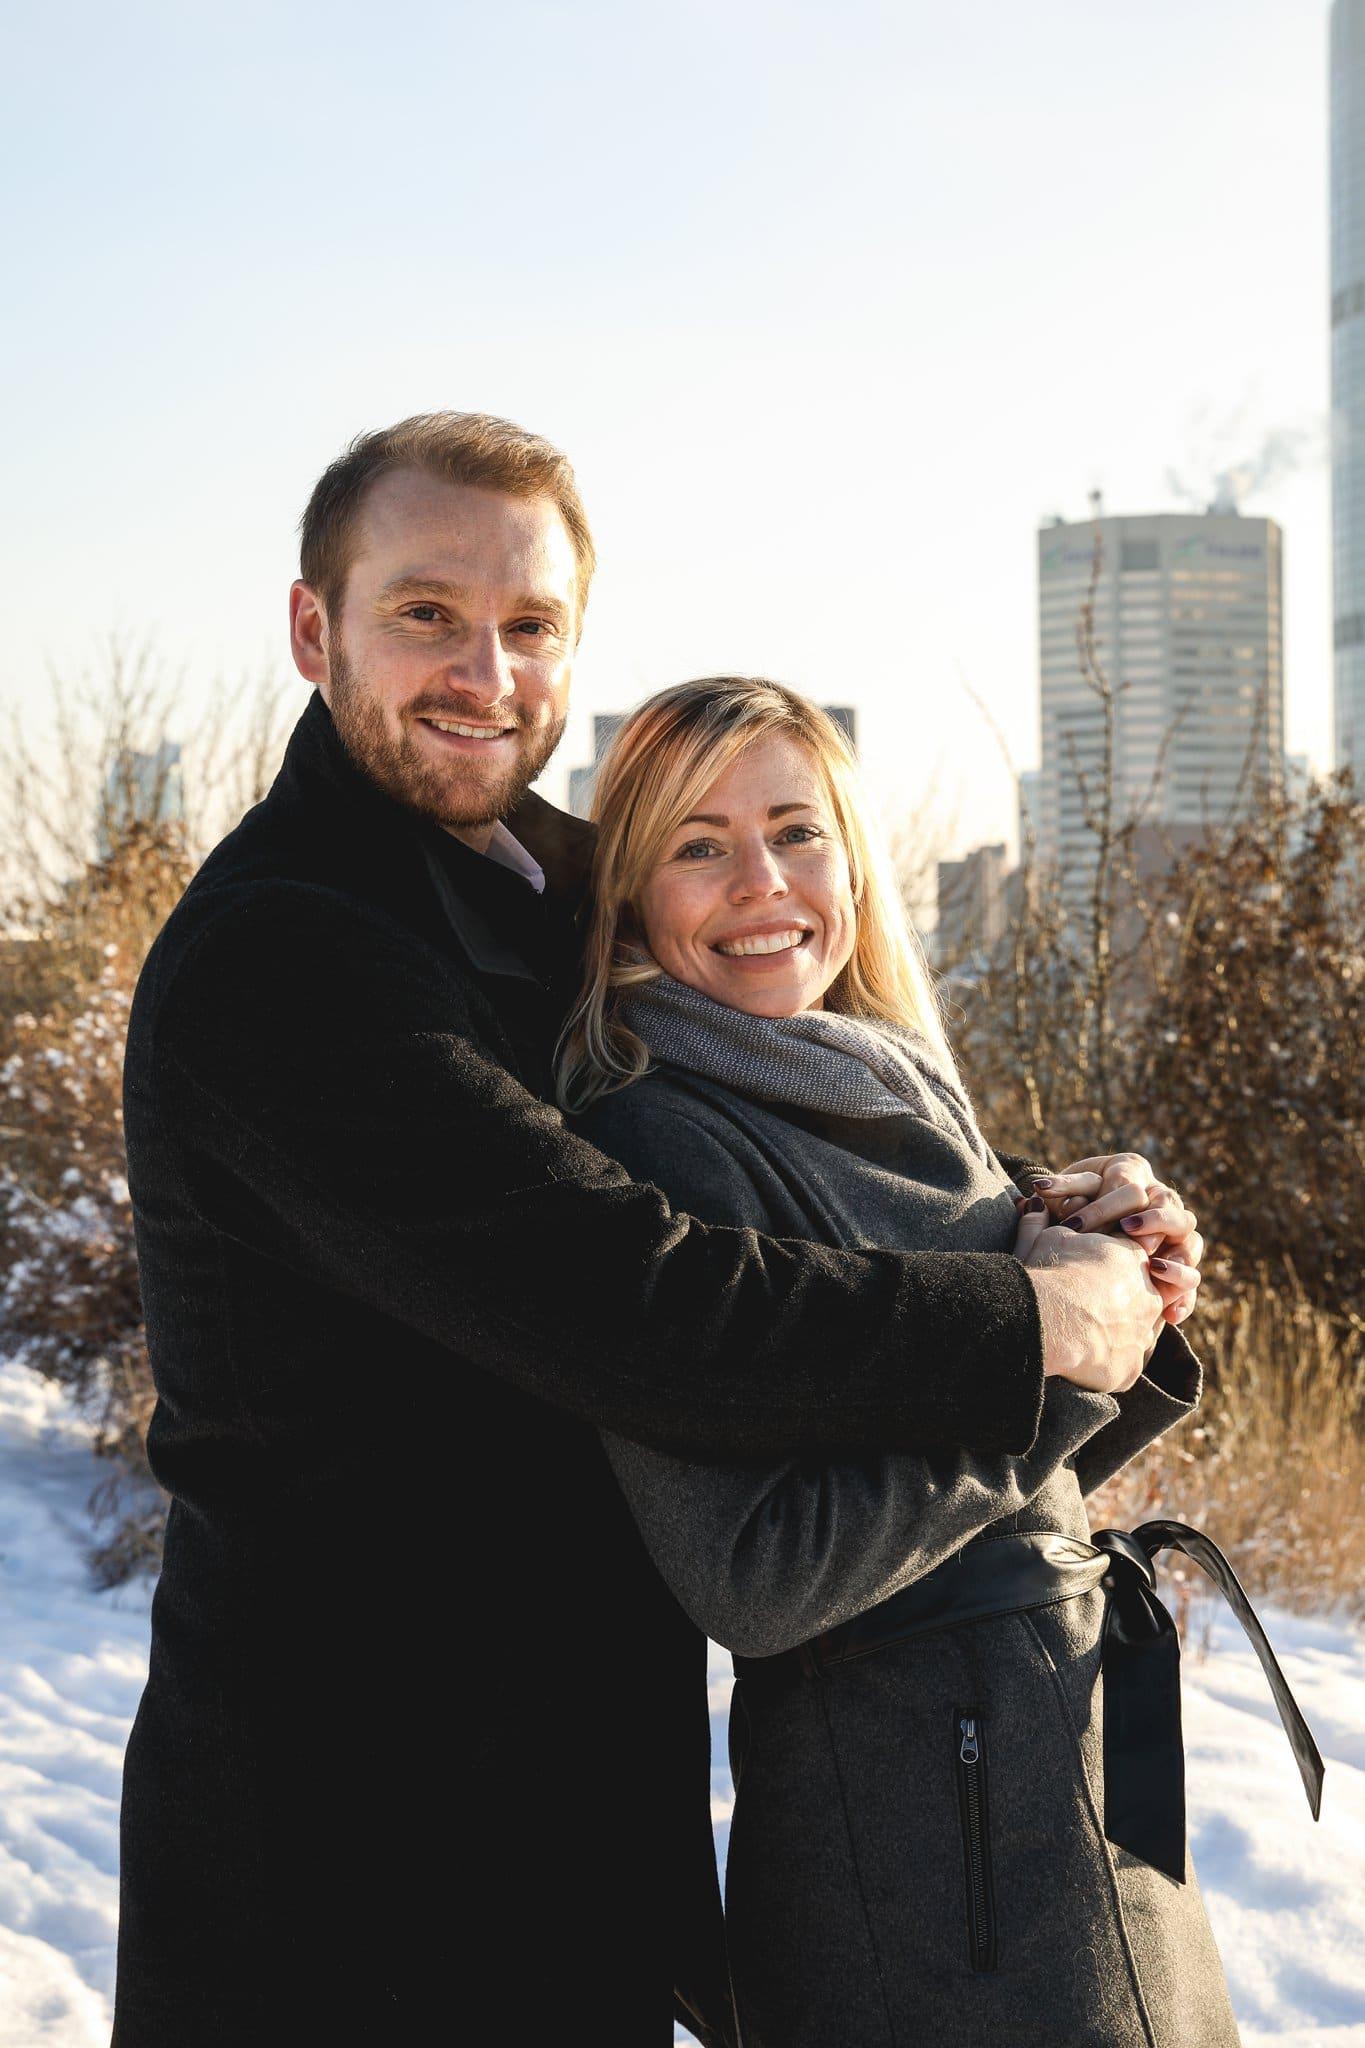 Ashley Daphne Photography Calgary Couple Wedding Photographer Engagement Photos Proposal Photos_0020.jpg